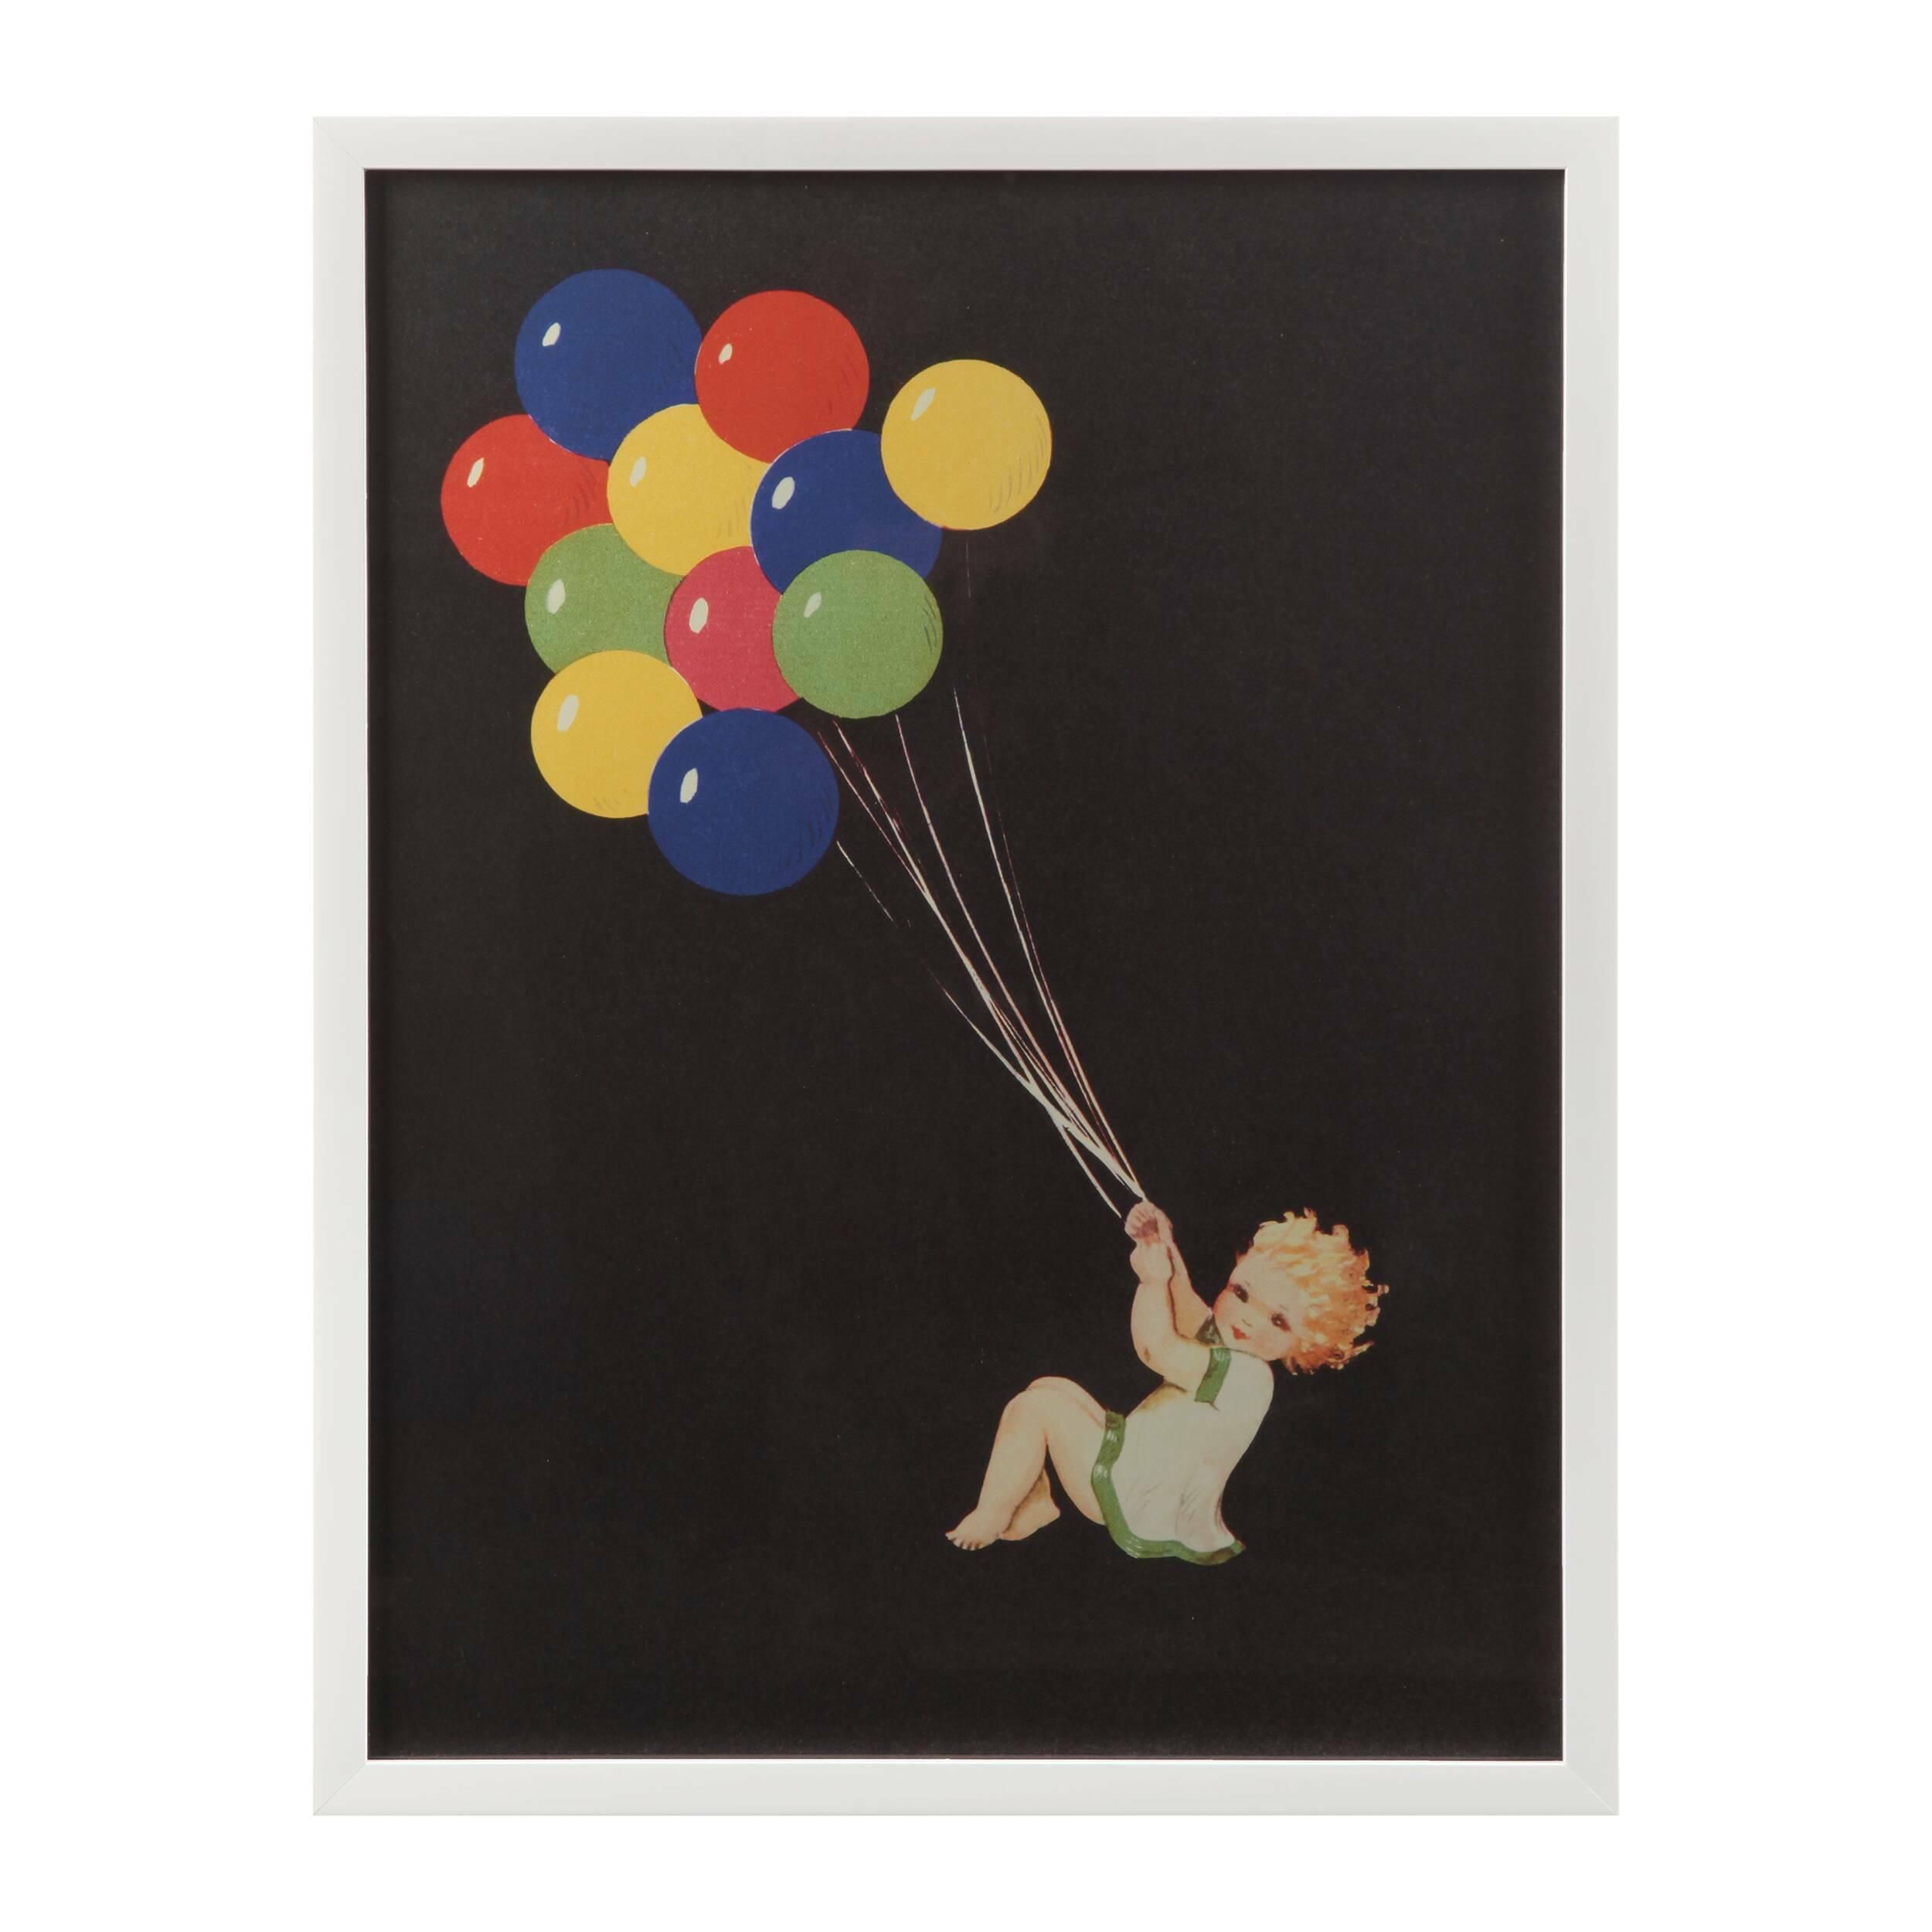 Постер Air Swings the cosmo cosmo 30